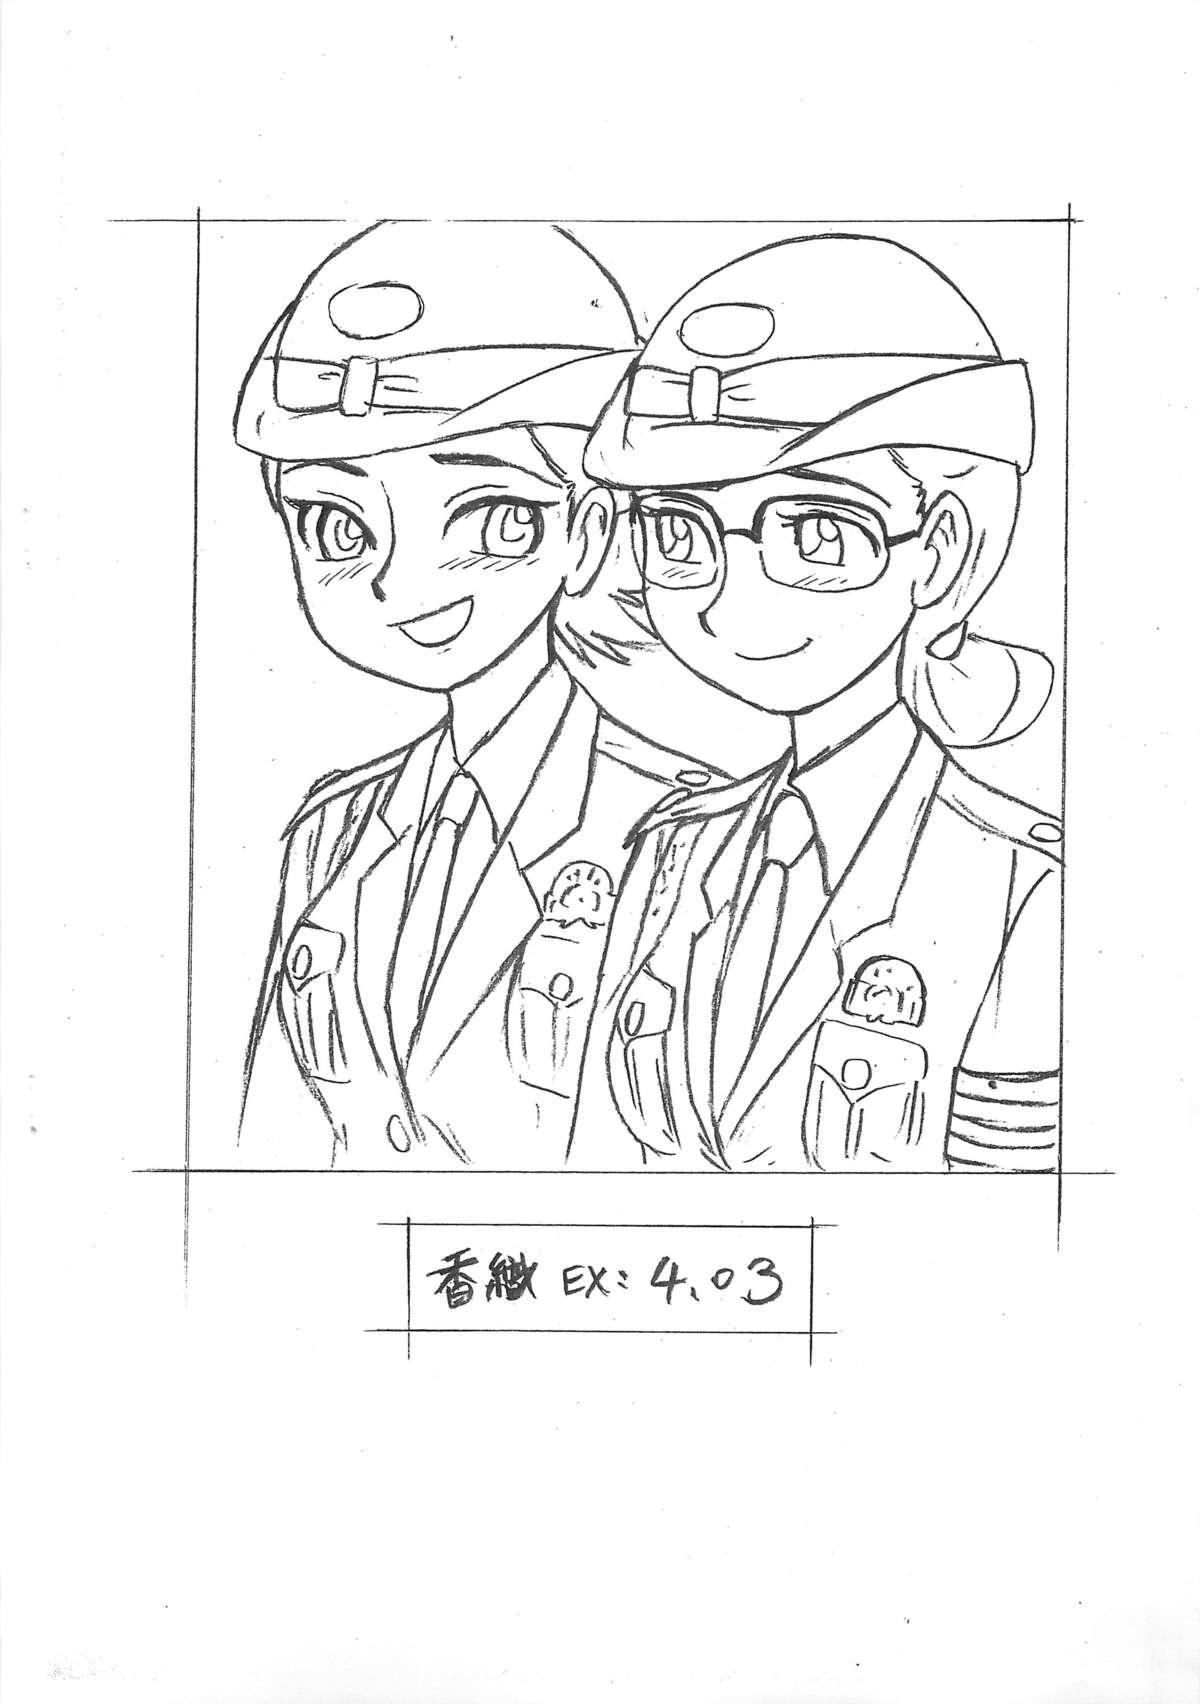 Kaori EX4.03 20